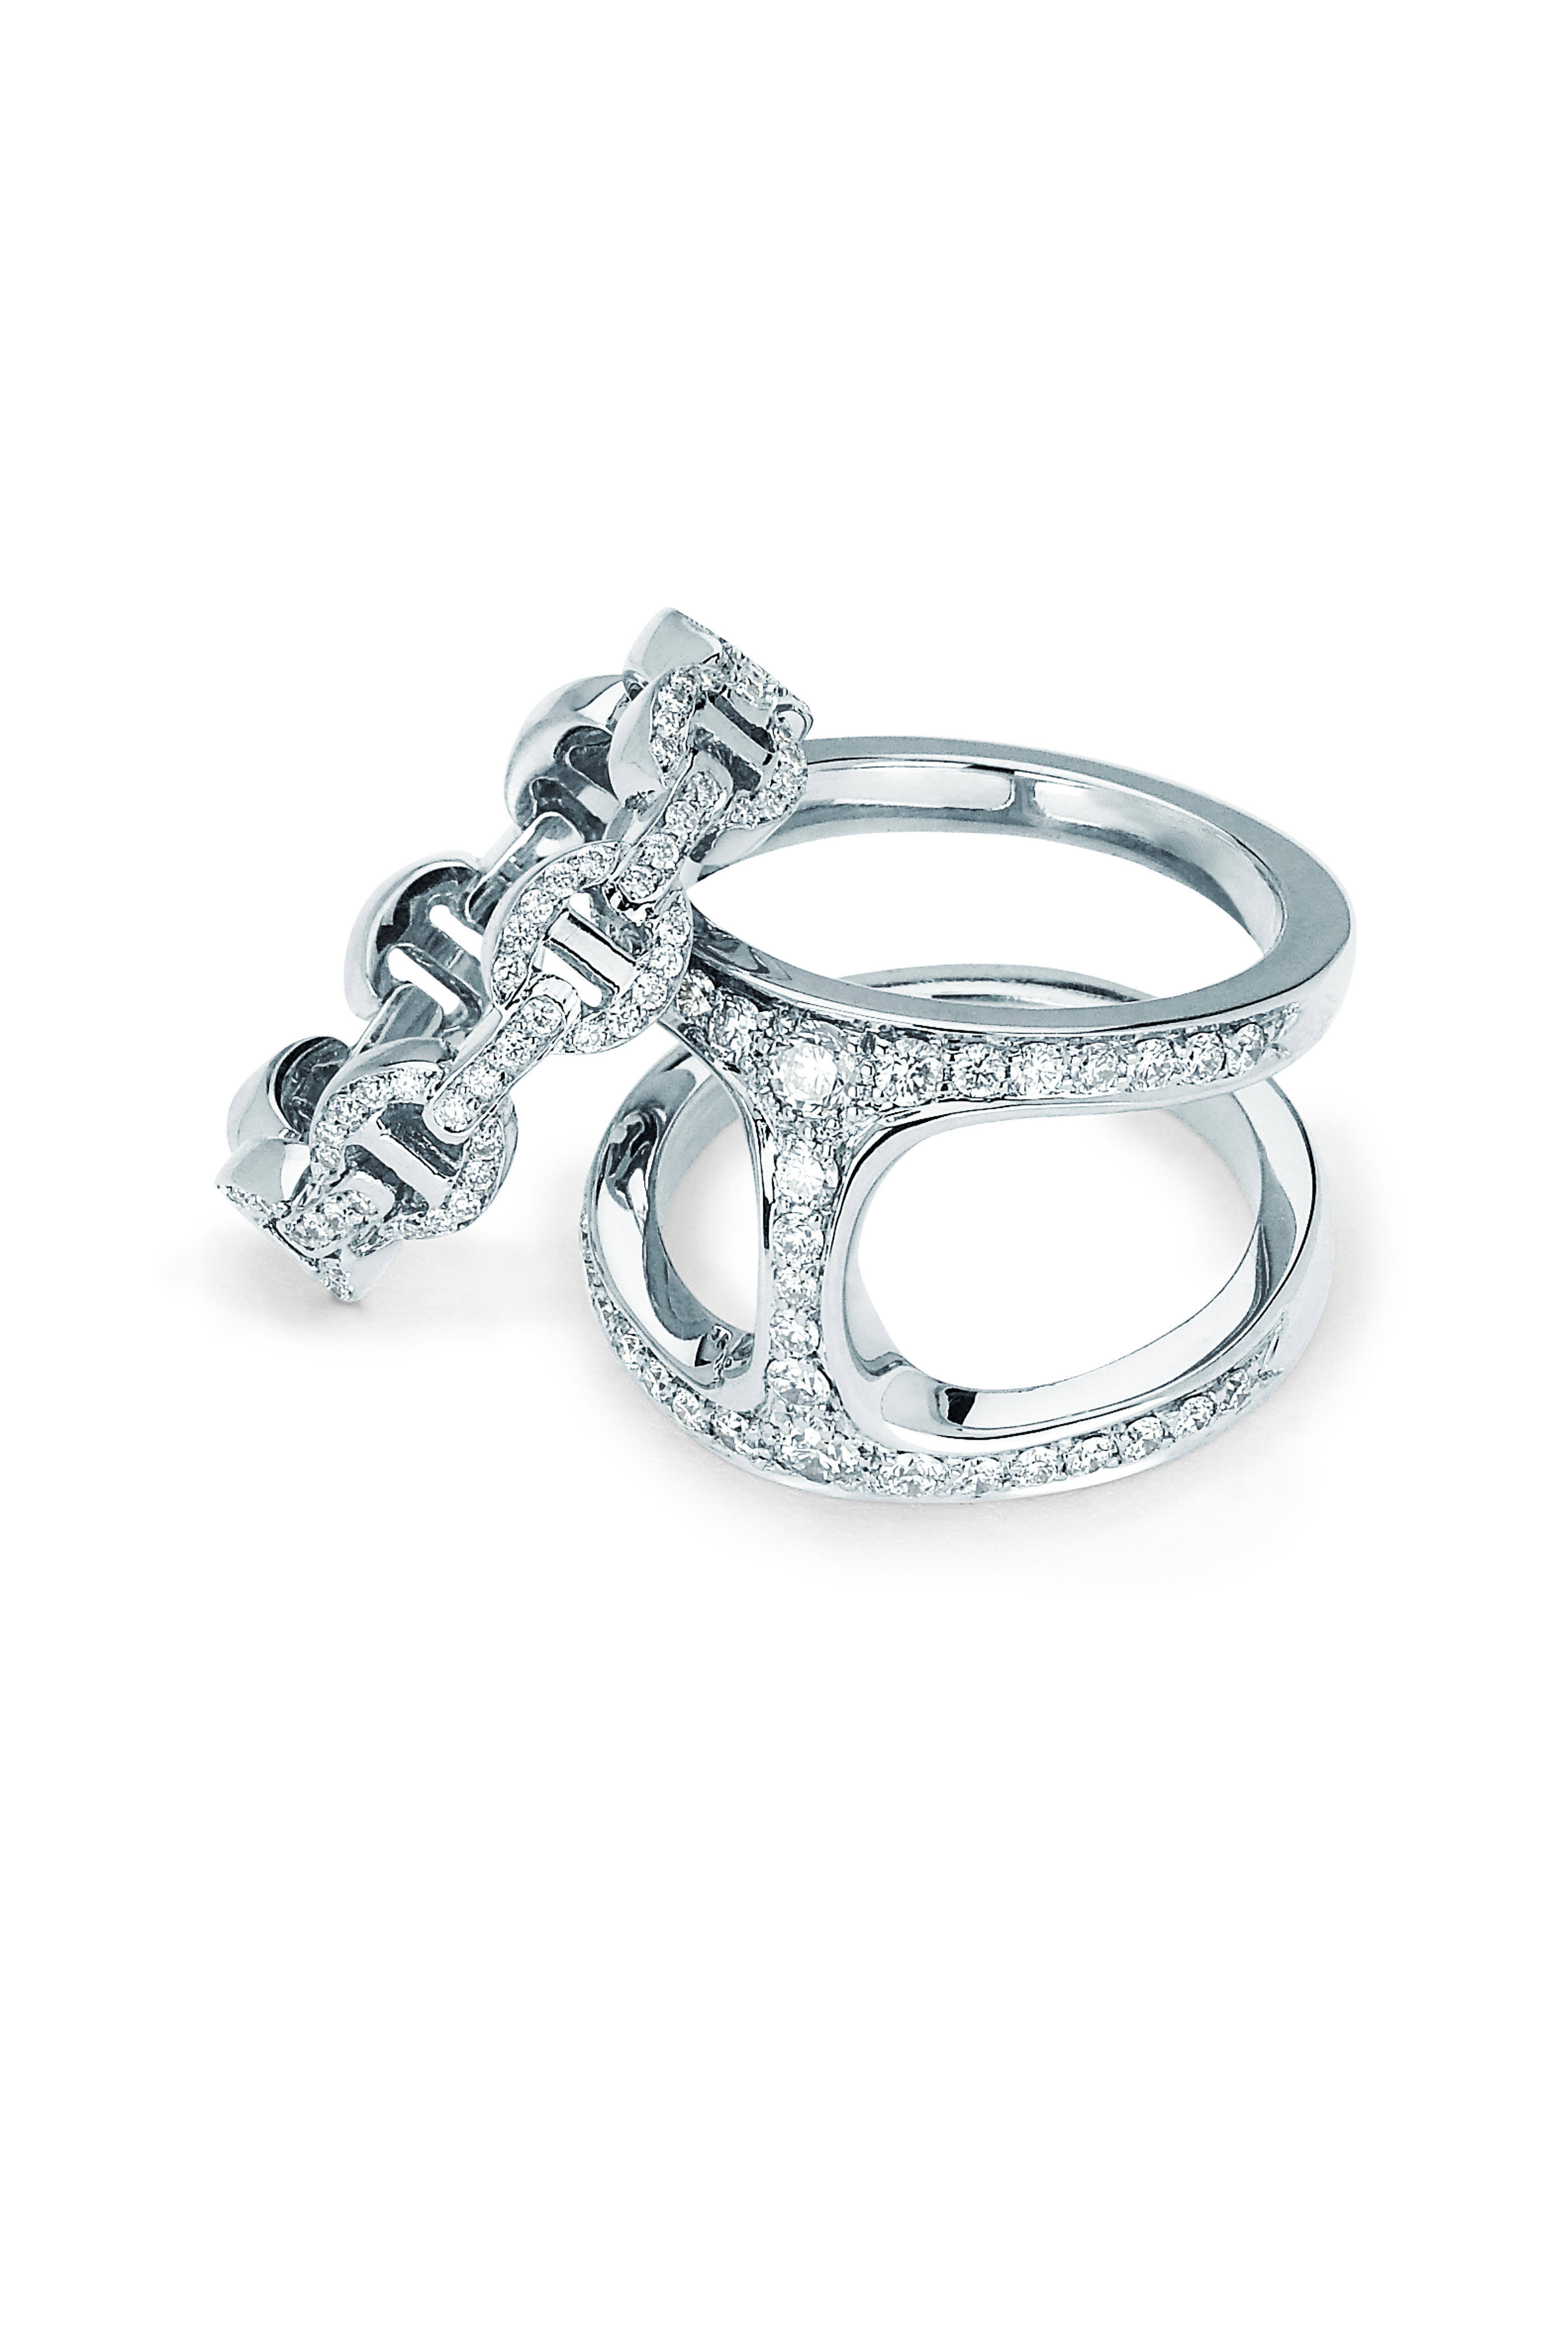 97758fa2 Hoorsenbuhs - 18K White Gold Dame Phantom Clique Ring | Mitchell Stores